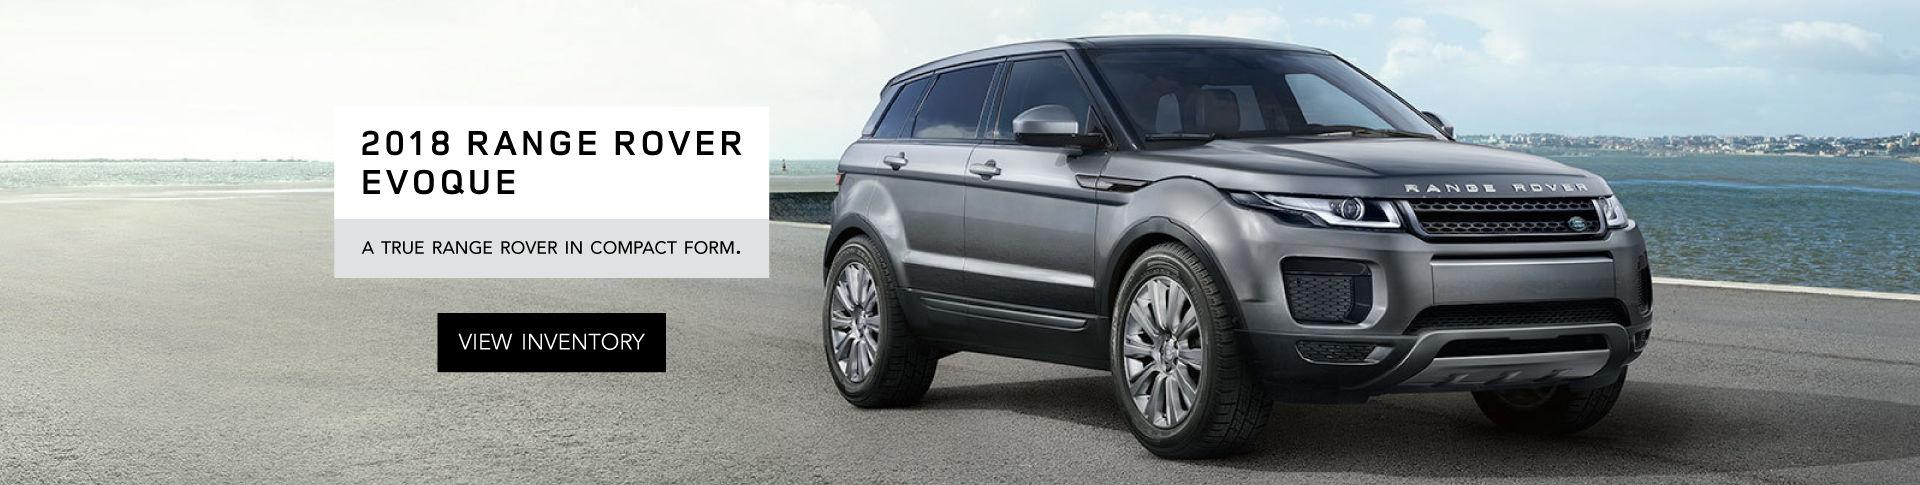 2018 Range Rover Evoque